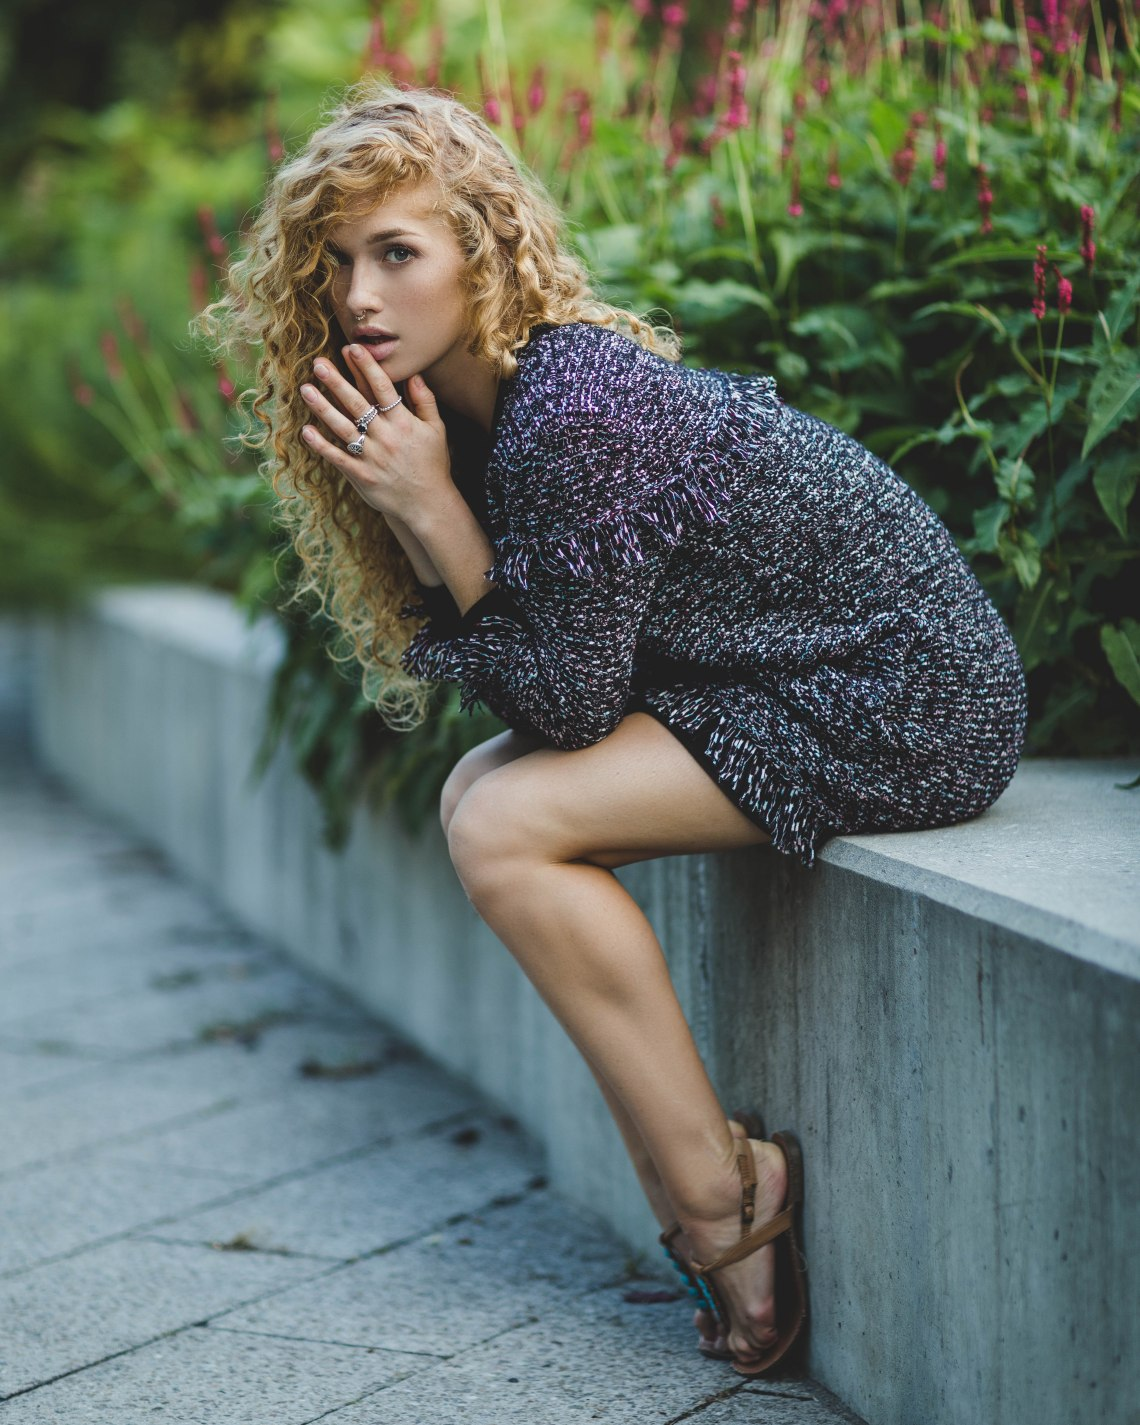 woman sitting on ledge